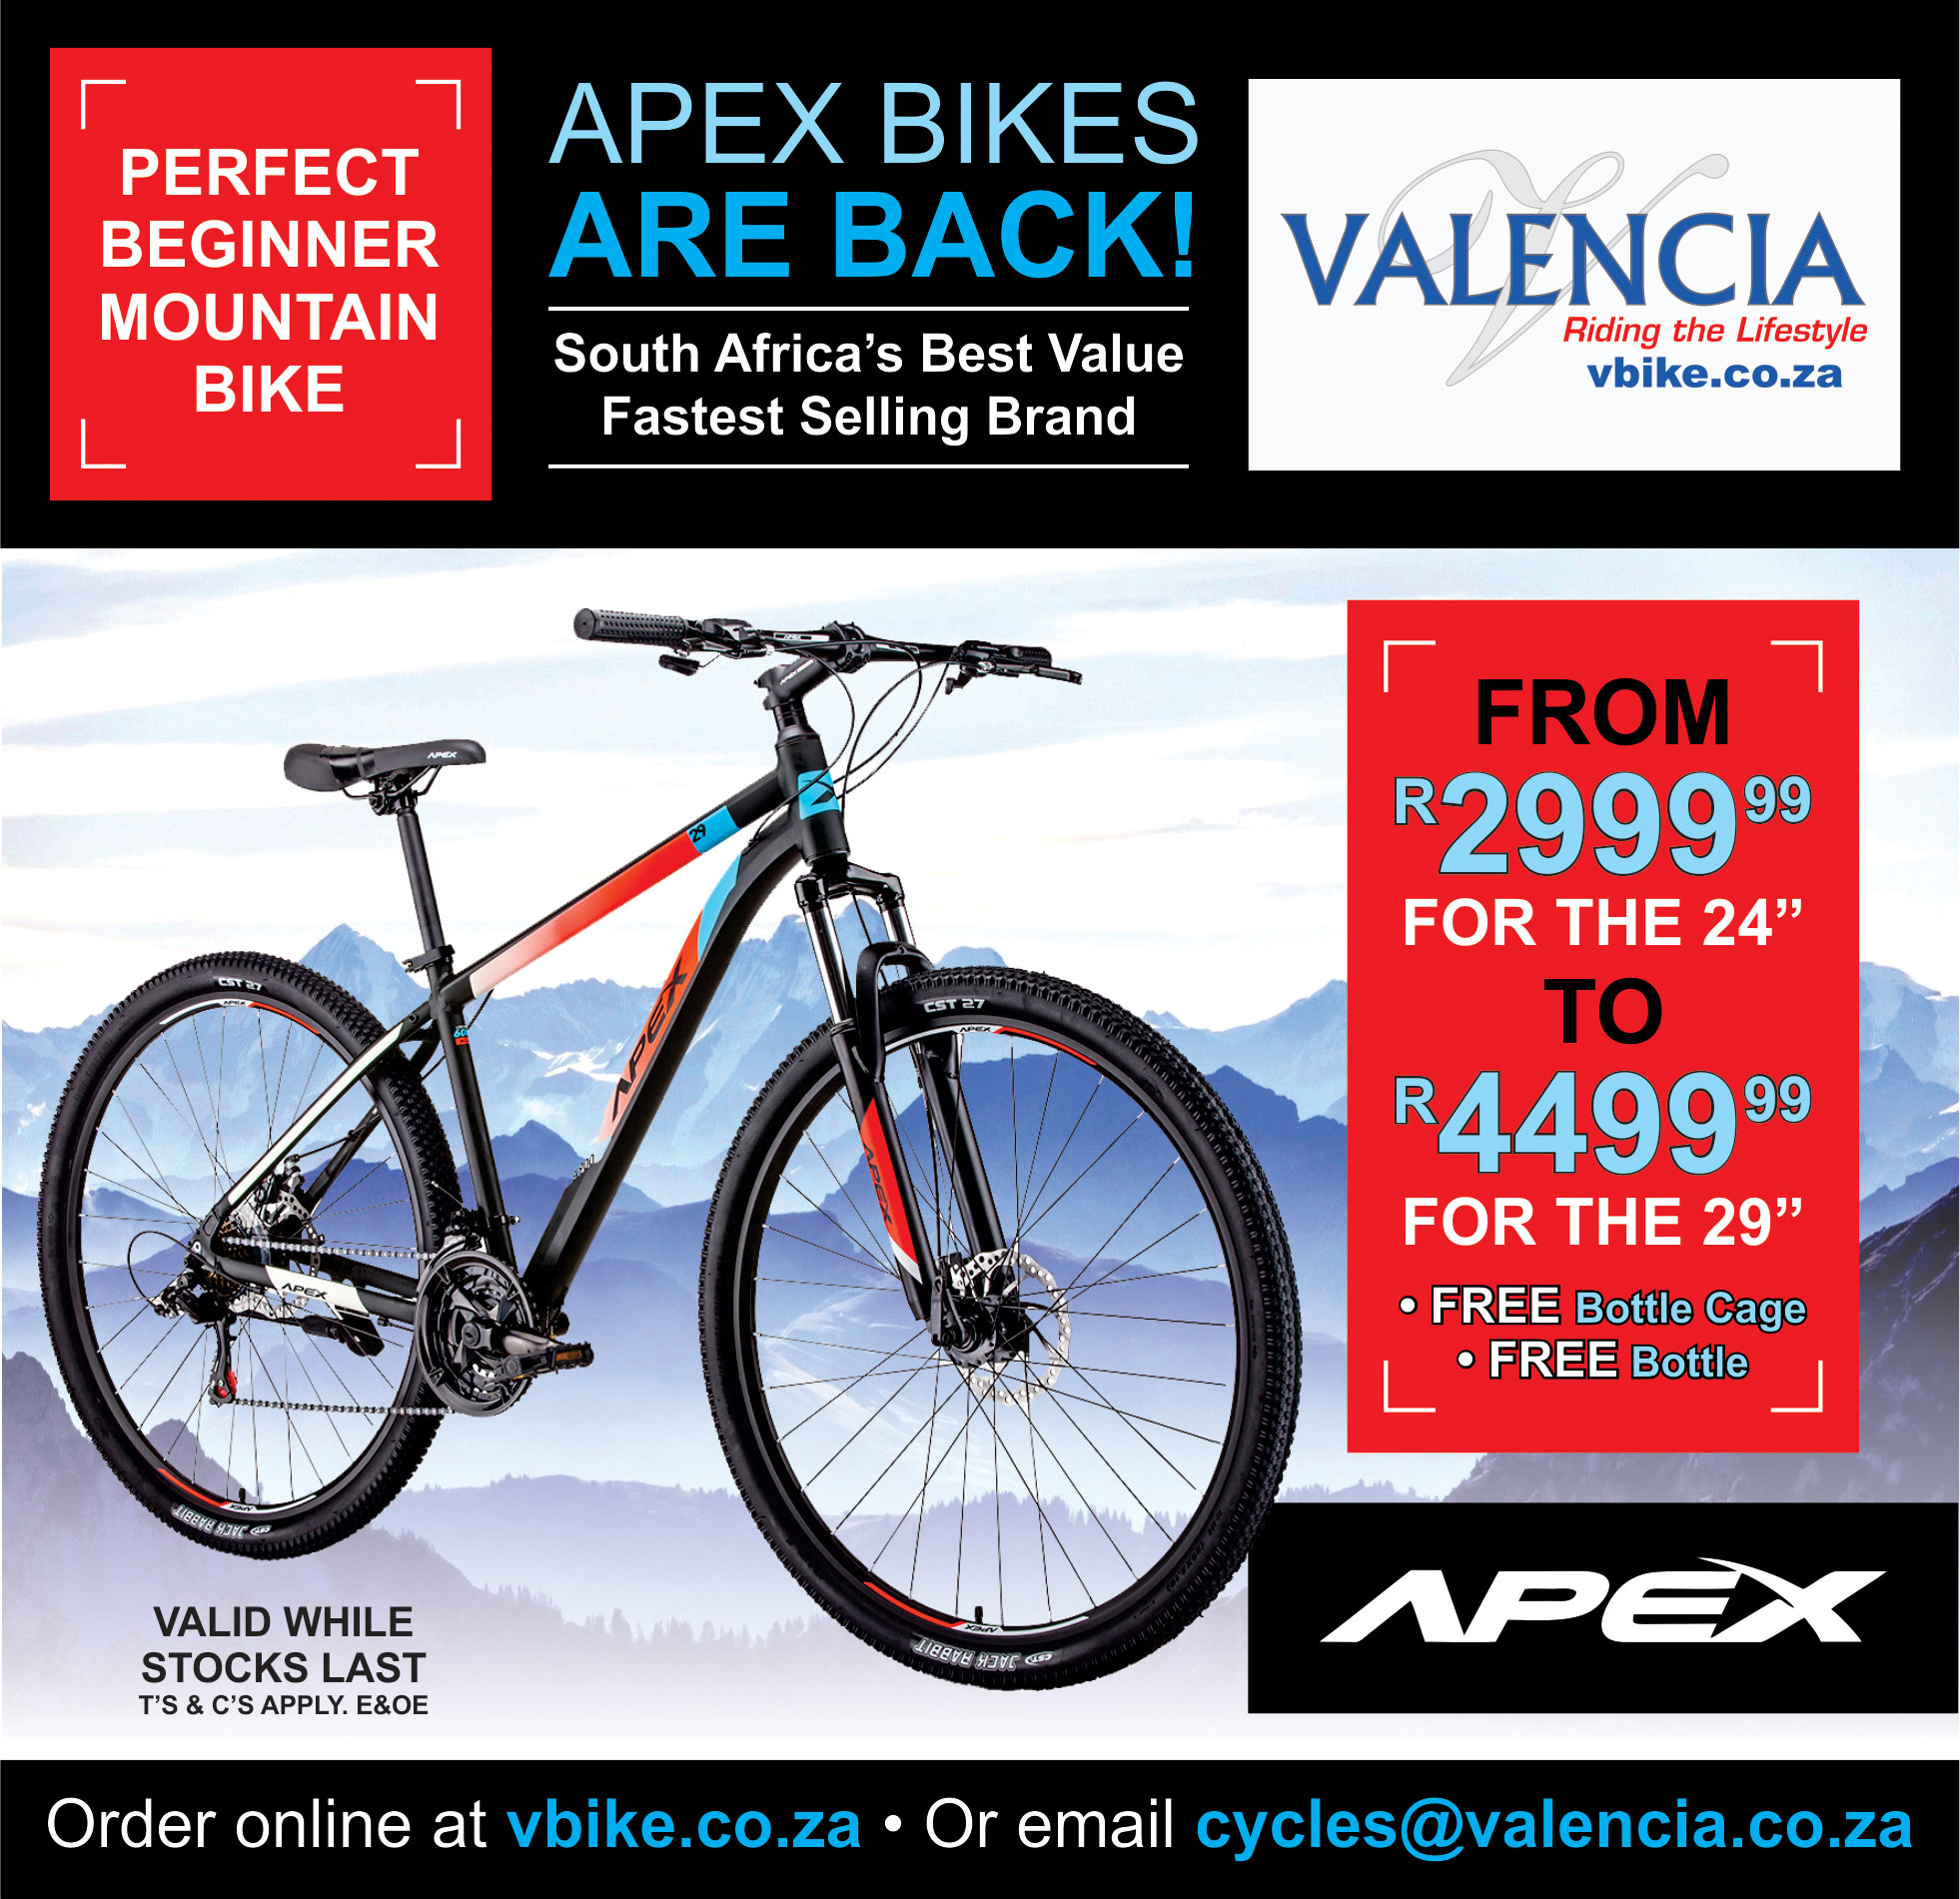 apex-bikes-ad-2-1-.jpg